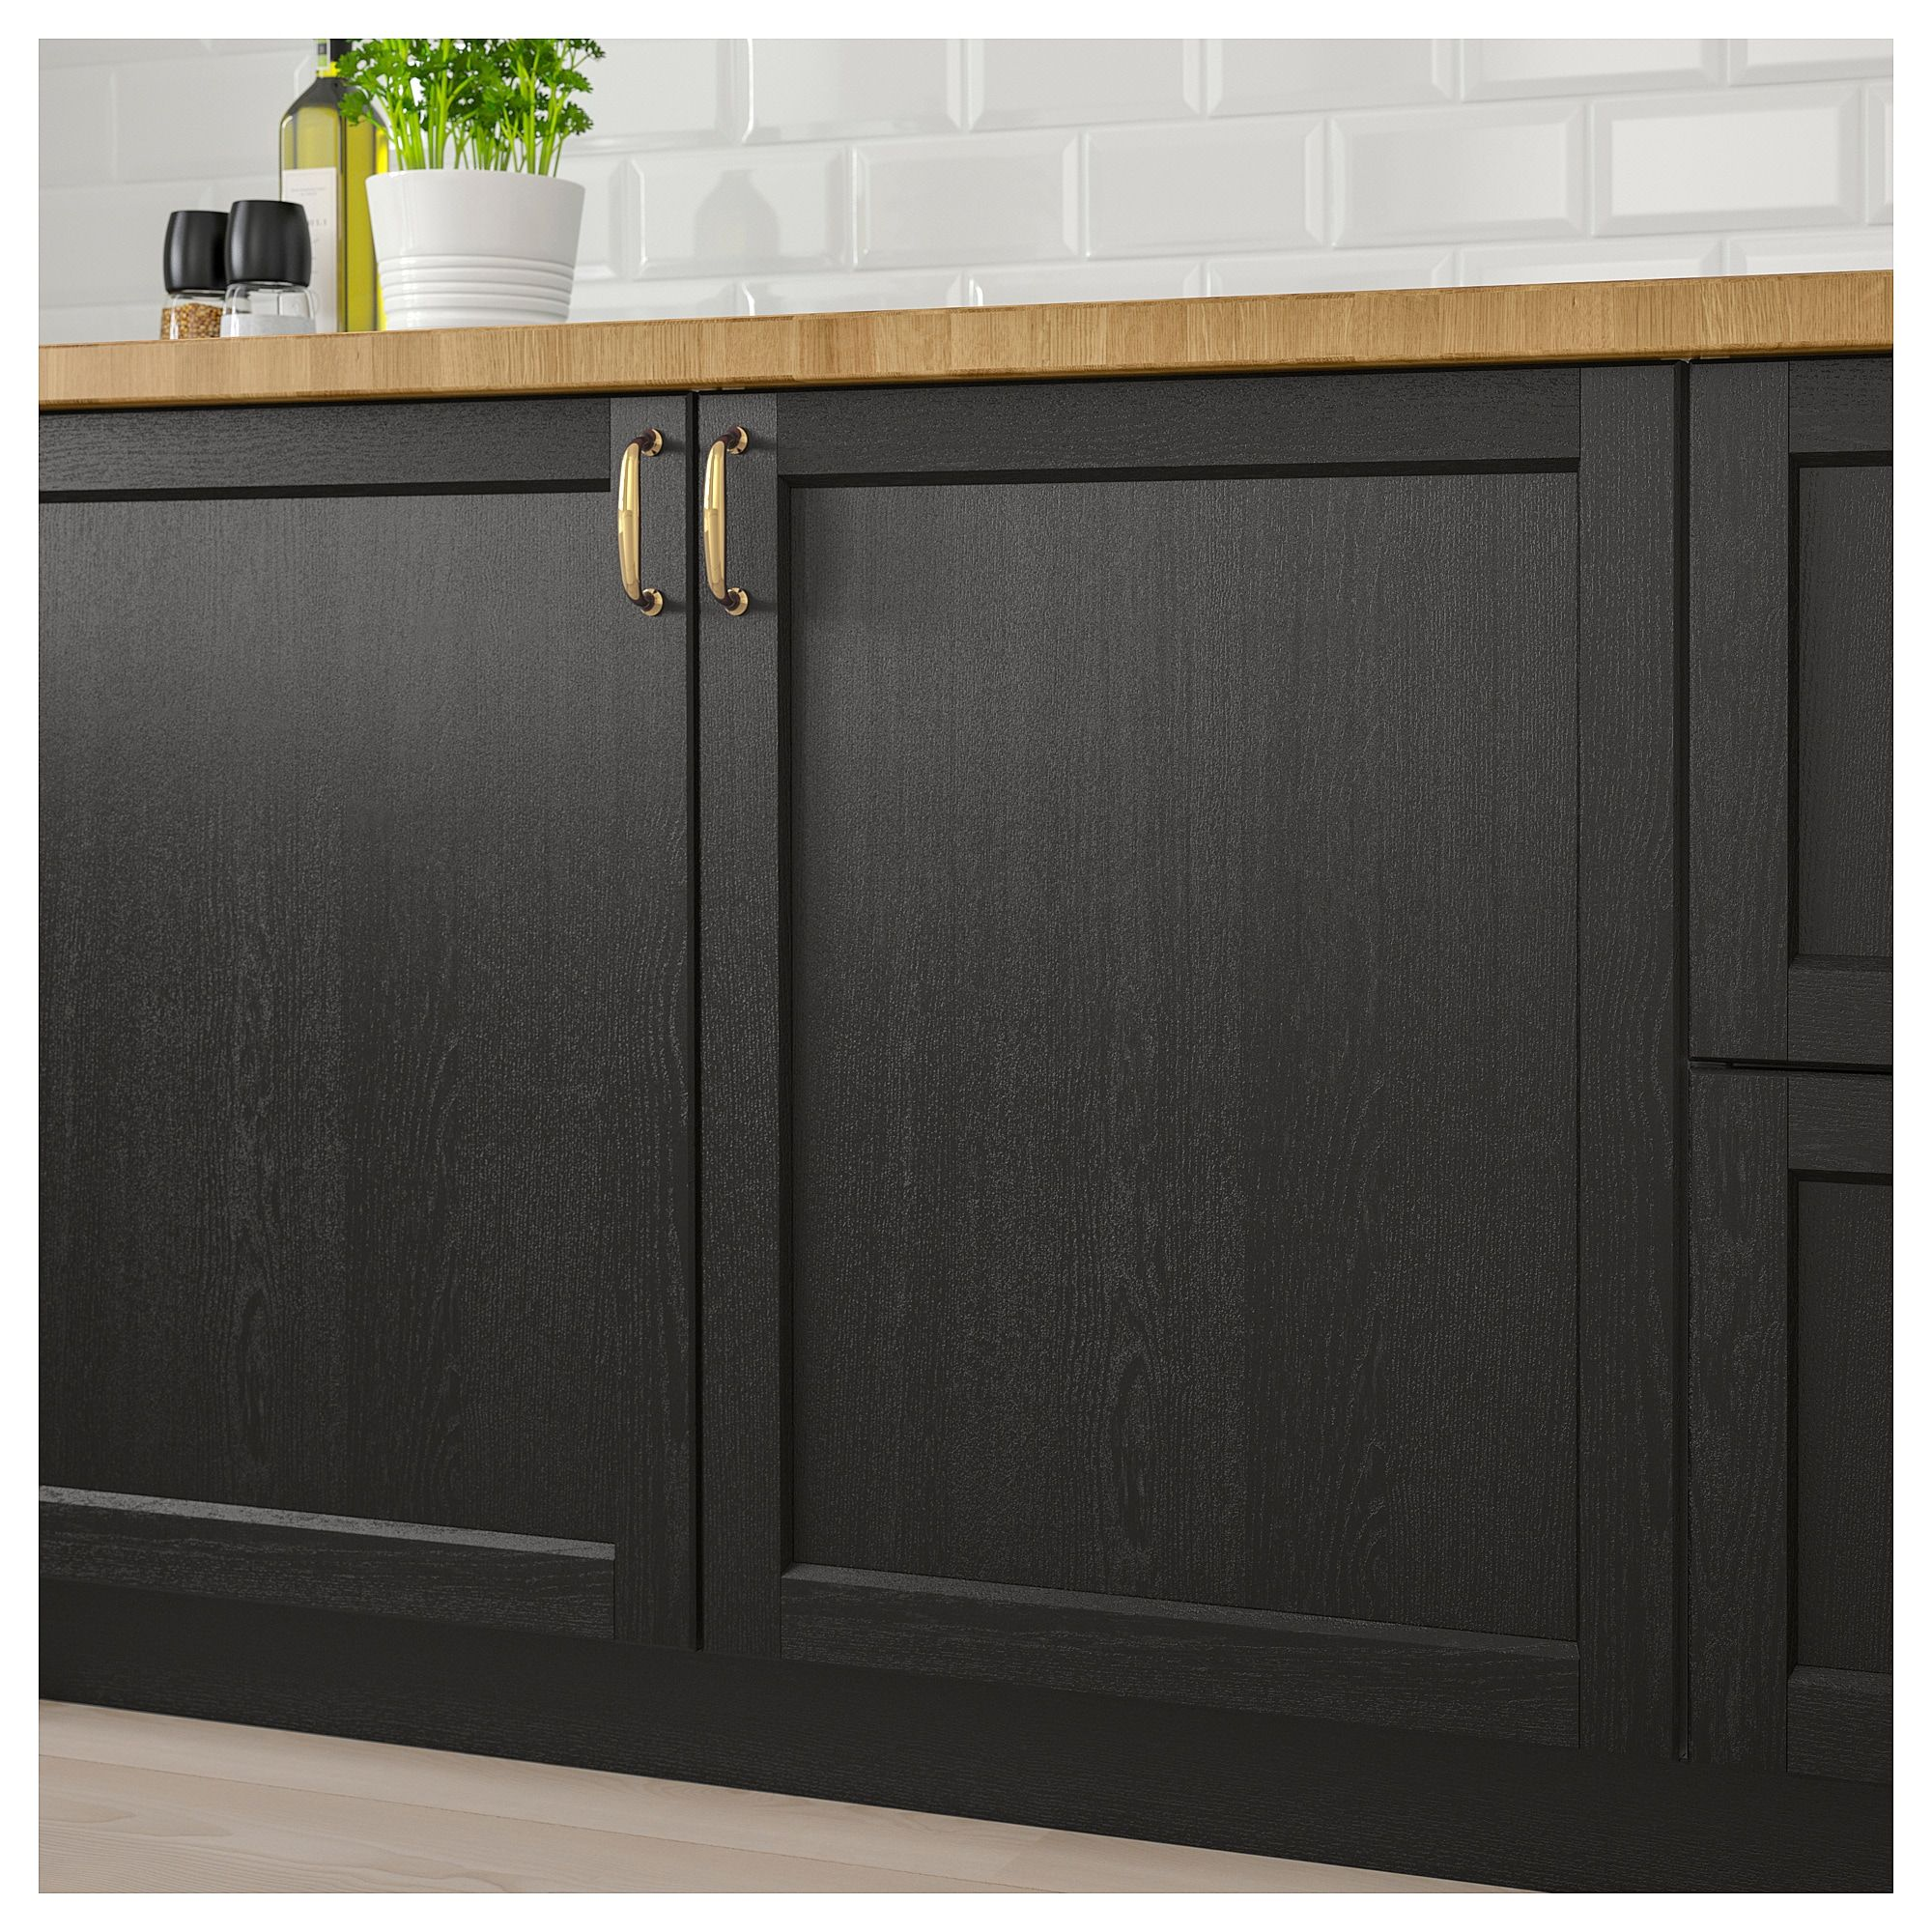 Lerhyttan 2 P Door Corner Base Cabinet Set Black Stained 13x30 Ikea In 2020 Kitchen Cabinet Remodel Black Kitchens Kitchen Renovation